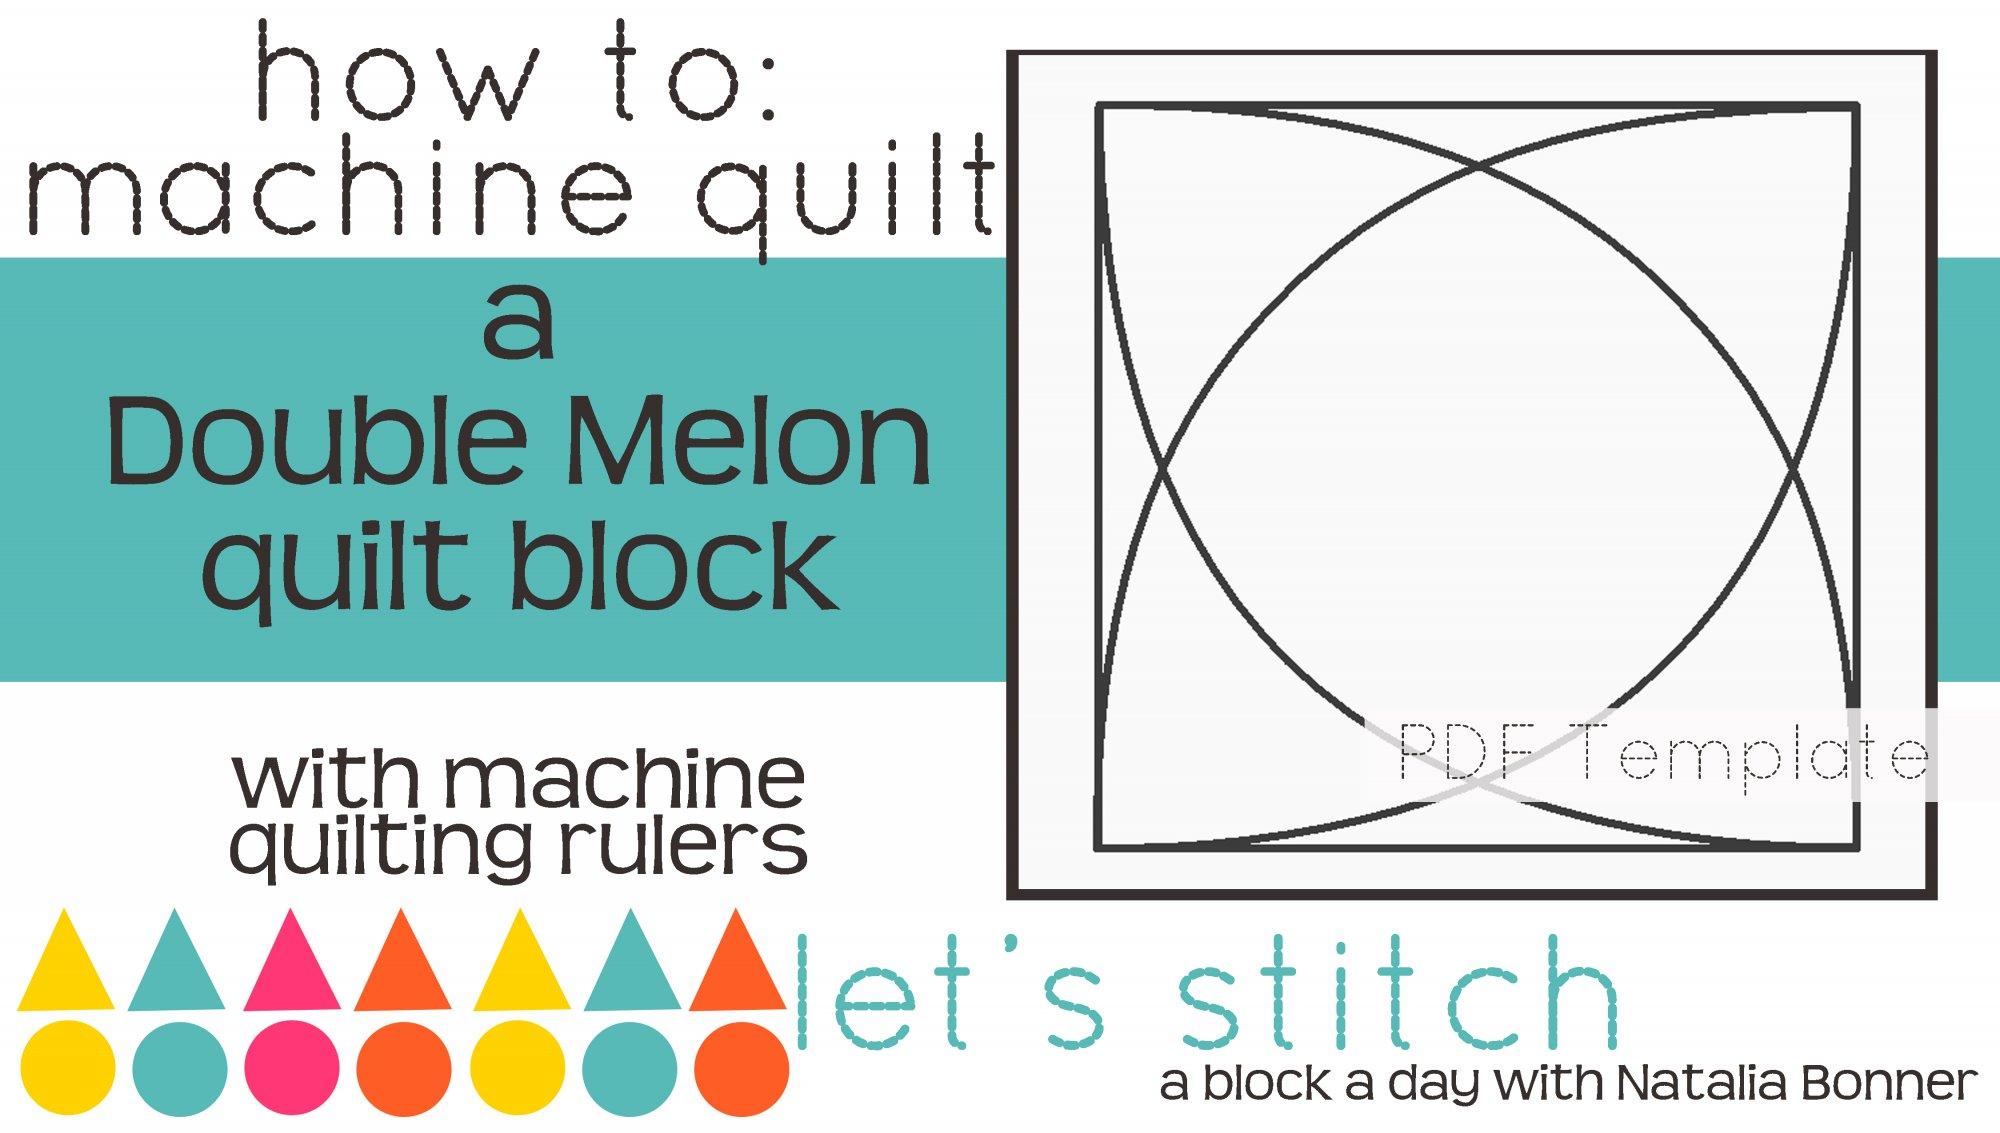 Let's Stitch - A Block a Day With Natalia Bonner - PDF - Double Melon